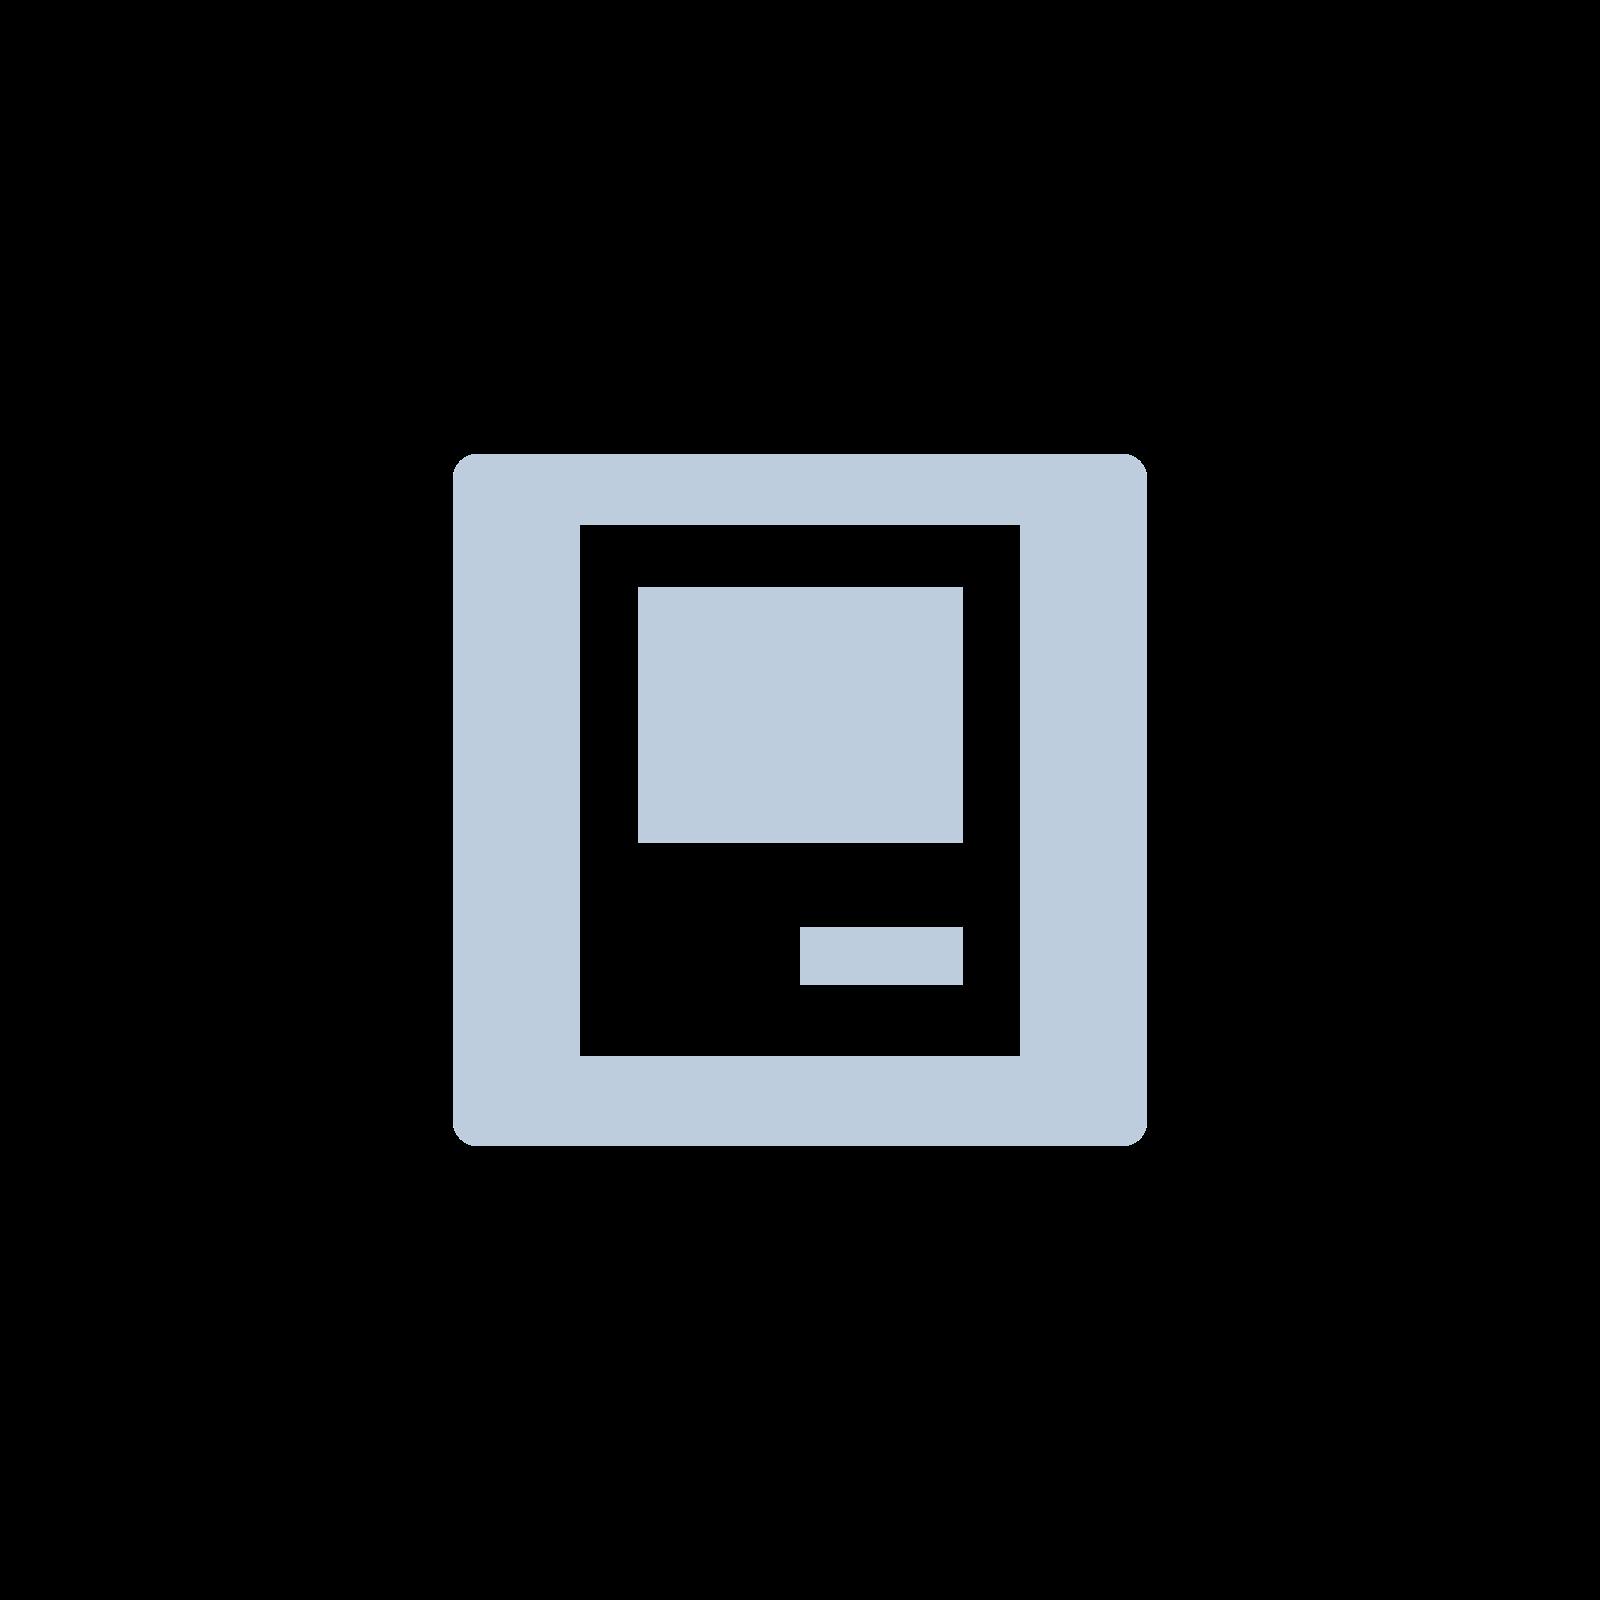 Mac mini Intel Core 2 Duo 2.4GHz (MacMini4,1, 320GB, 2GB)